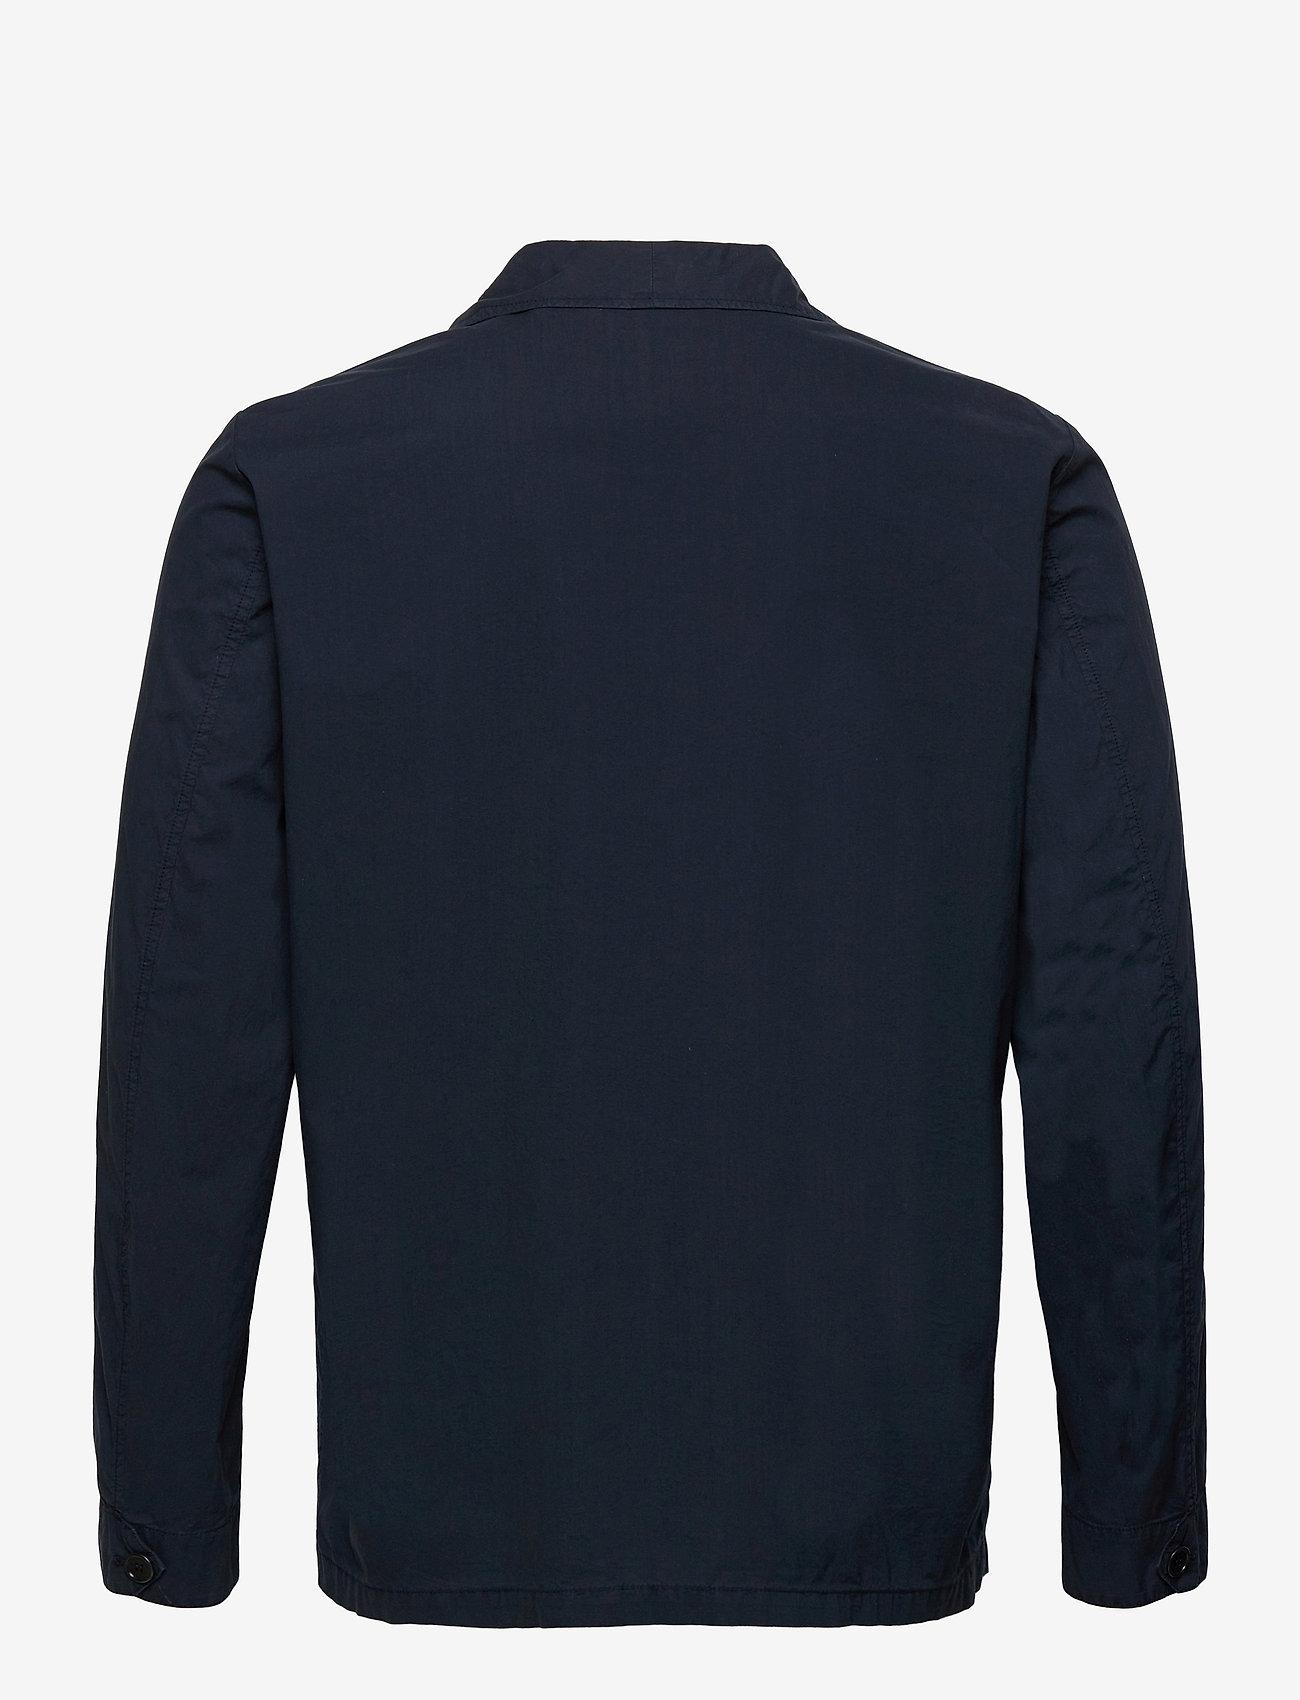 Aspesi - GIACCA RI - PIJI - single breasted blazers - navy - 1